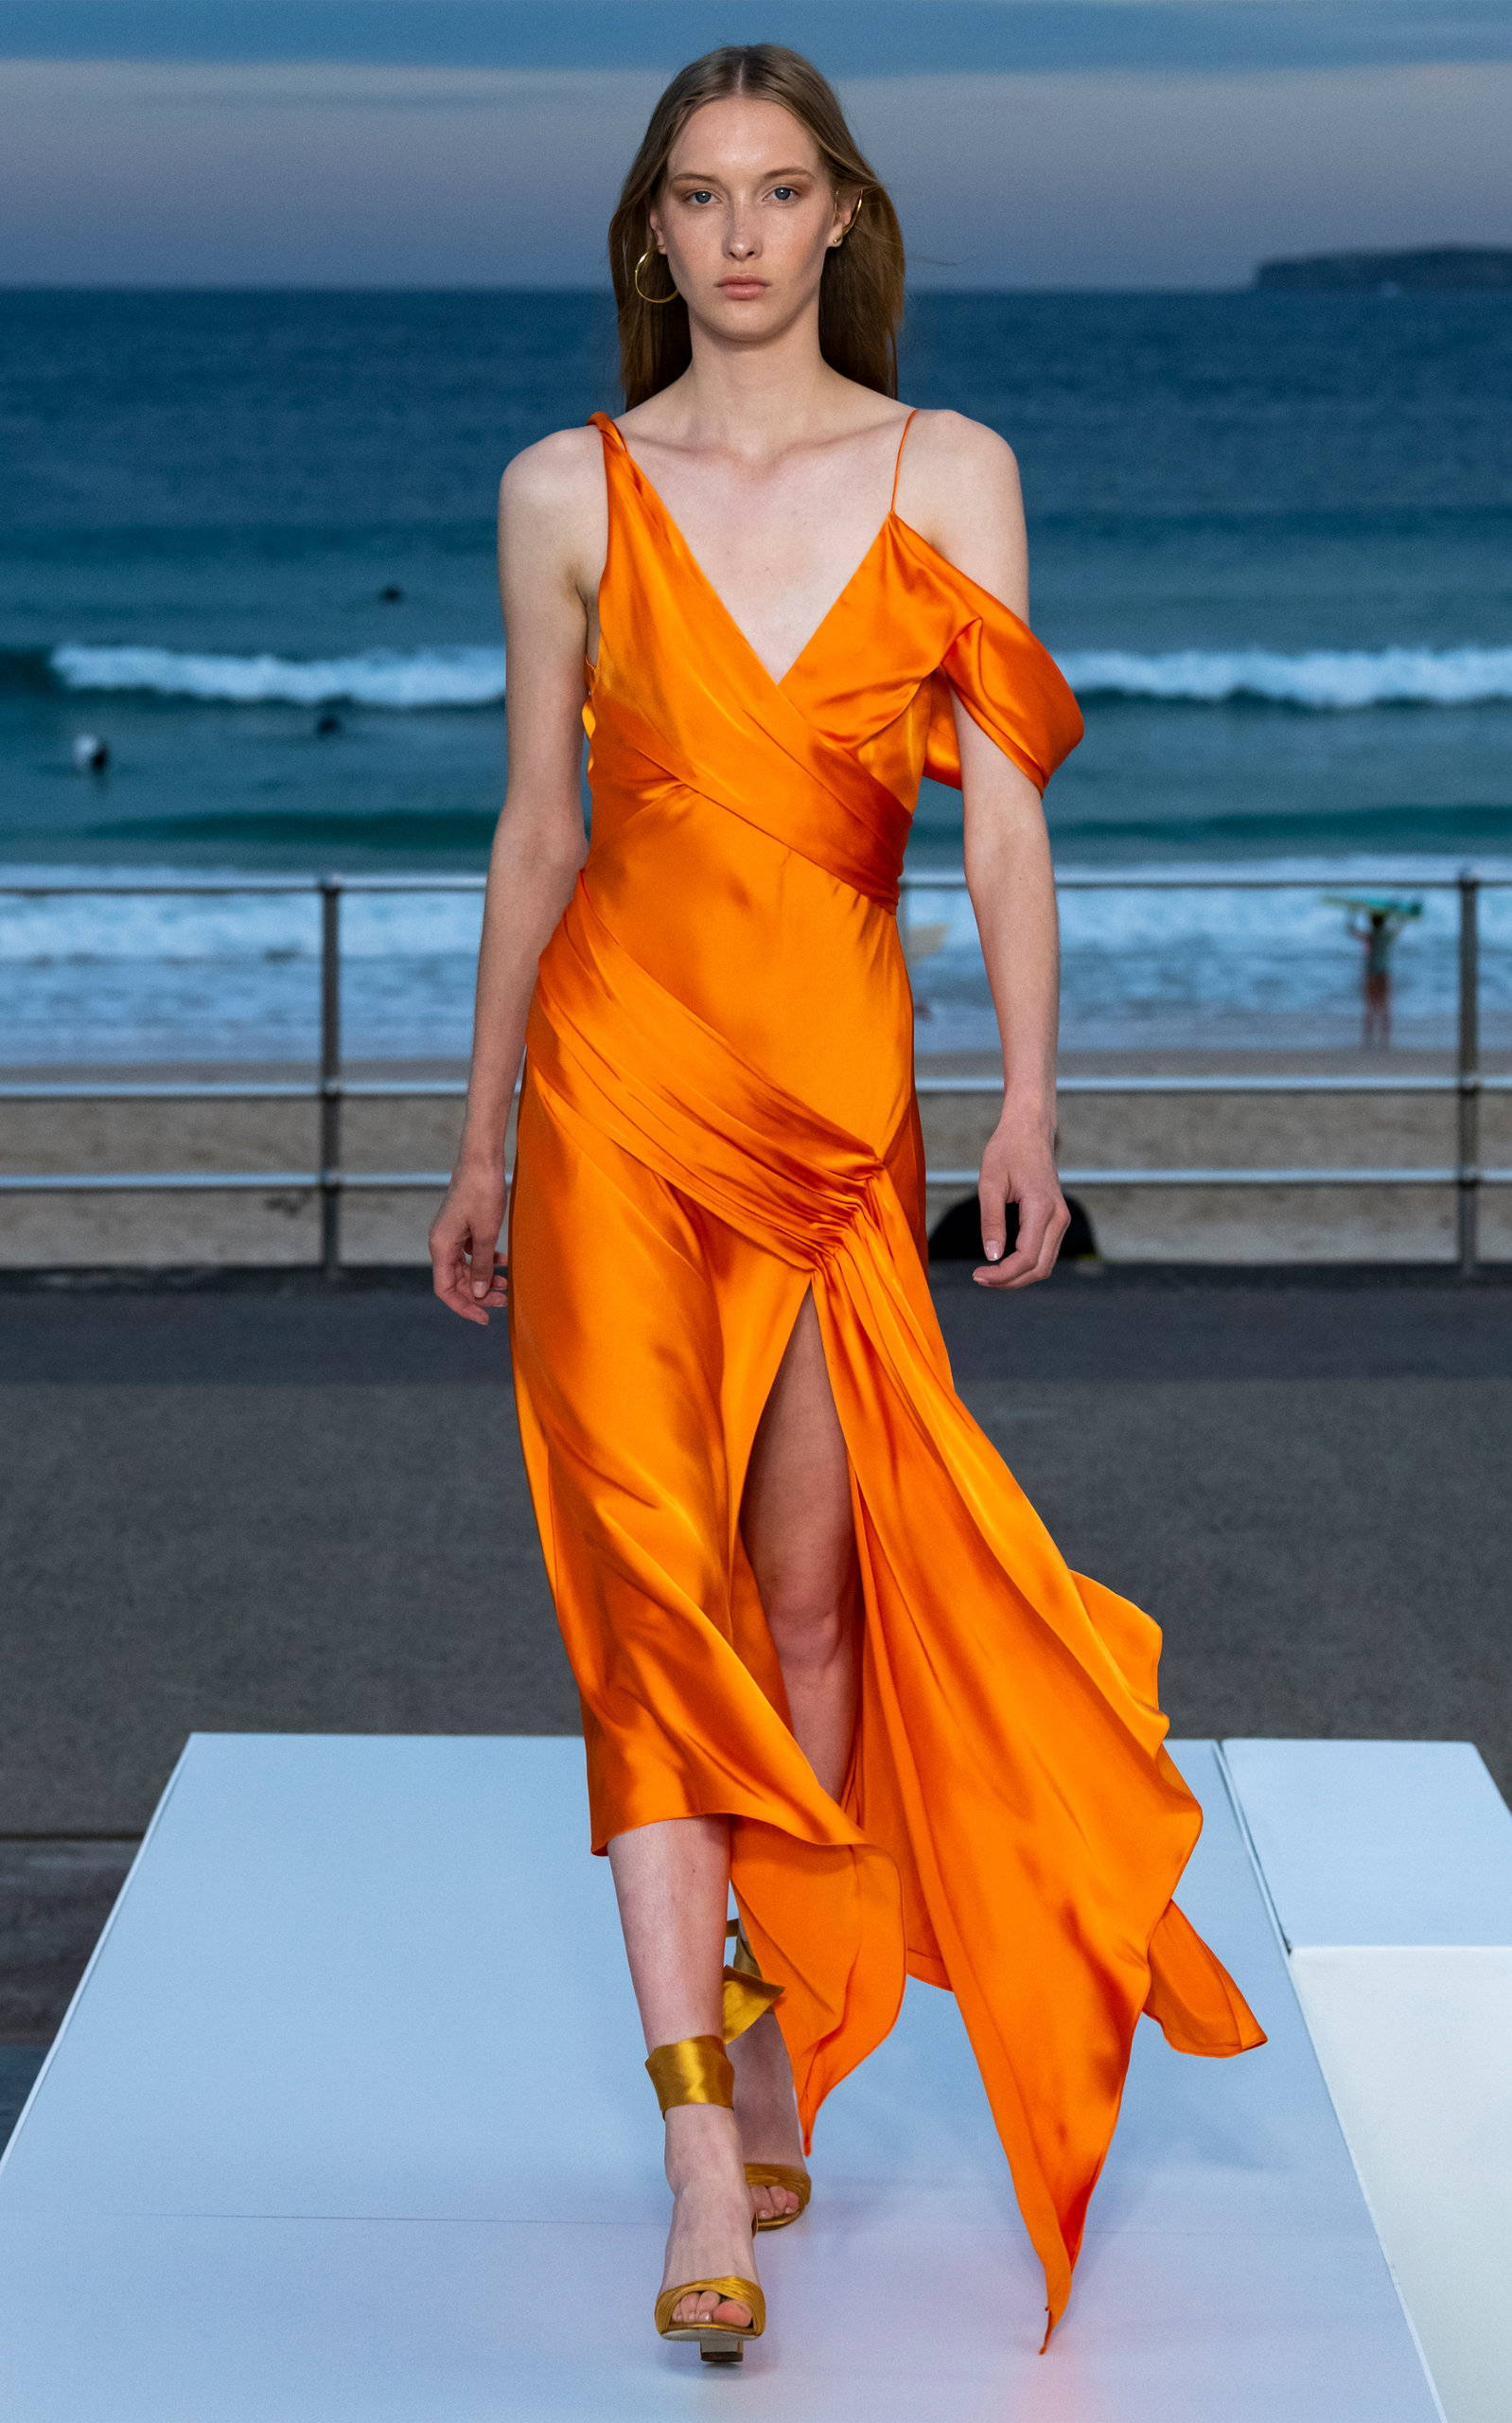 Ieva Katana Fashion Blog Bra Top Trend